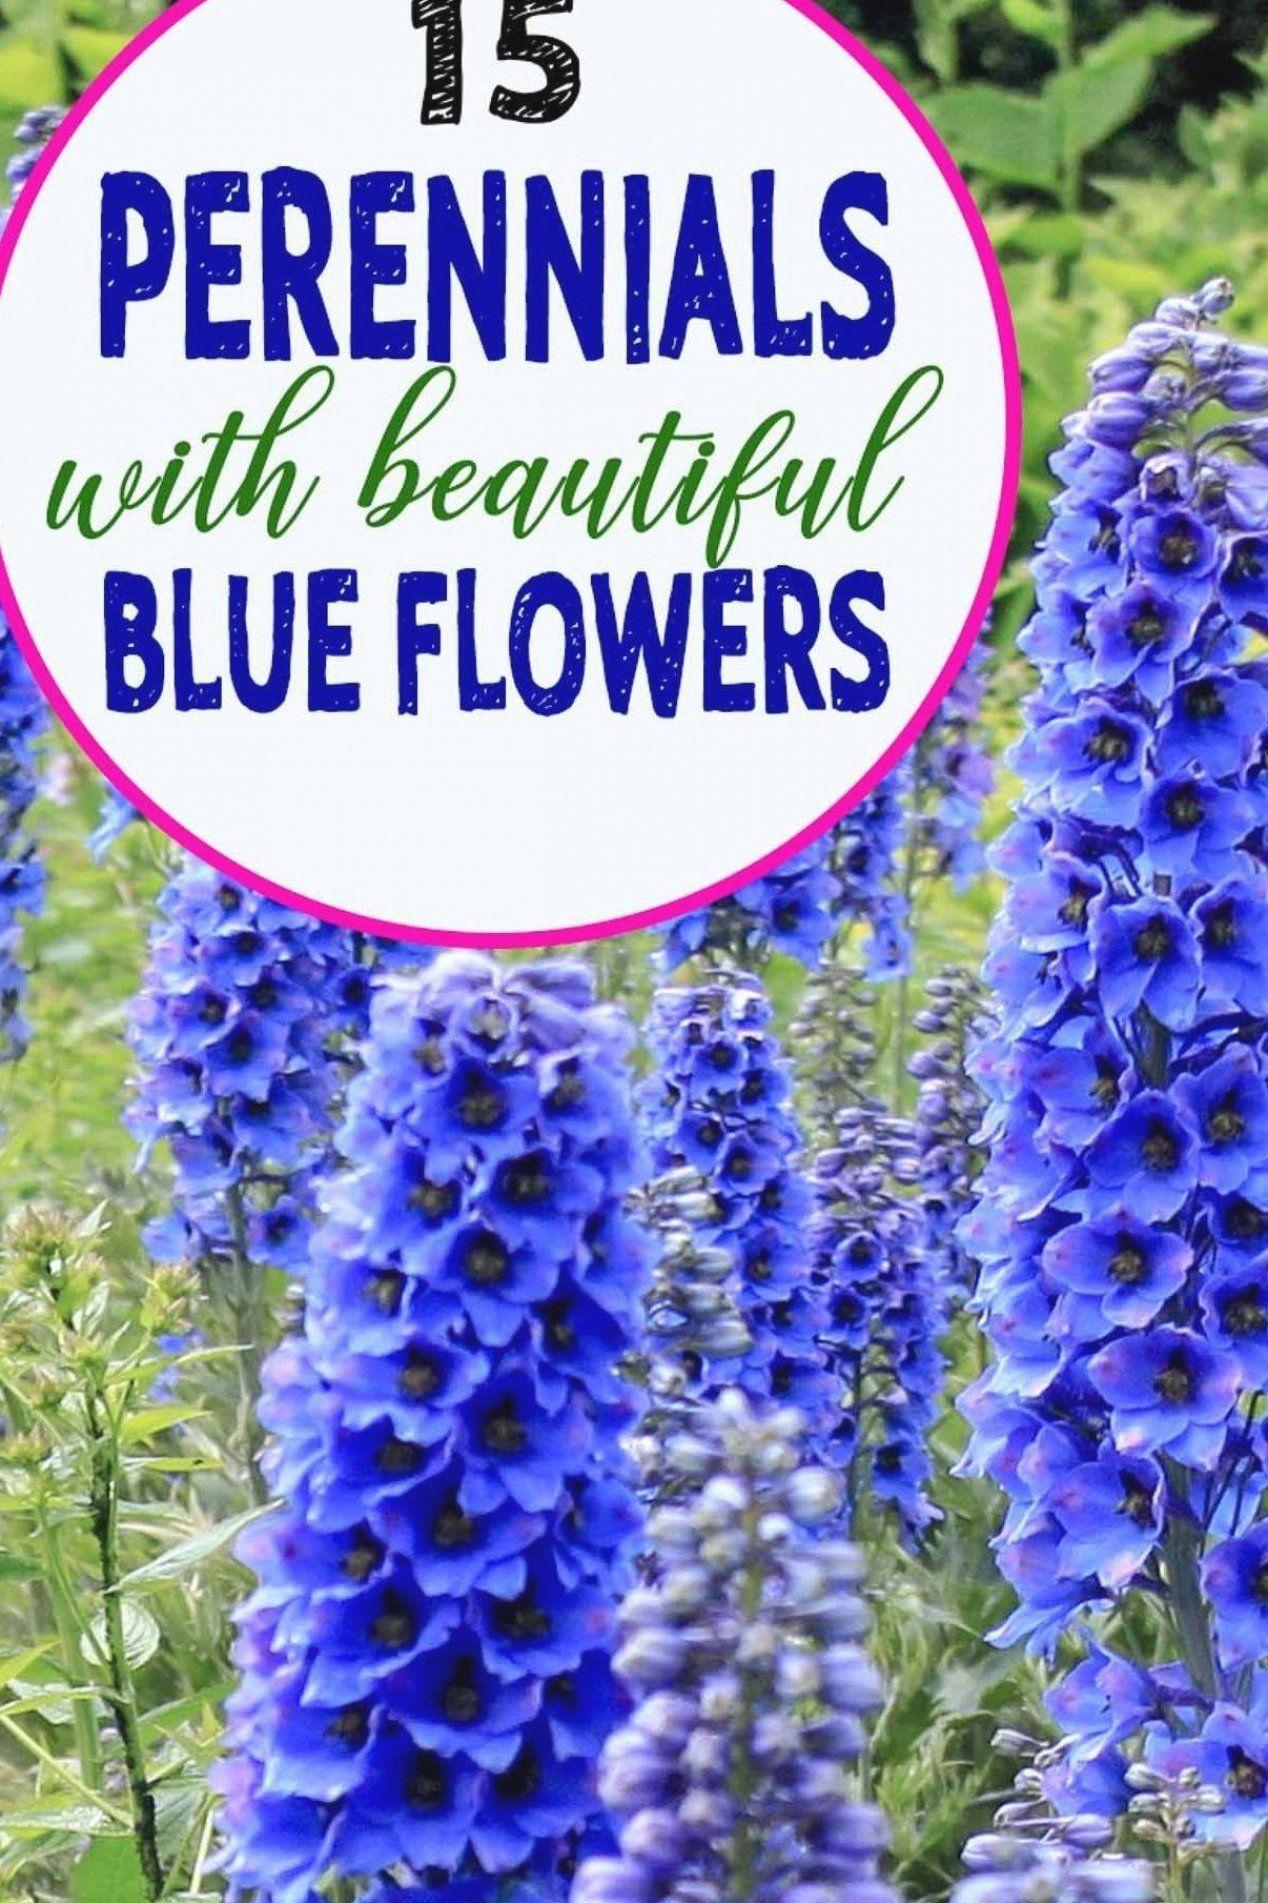 Fromhousetohome Maintenance Gardenideas Blueflowers Perennials Flowers Require Provide Planted Plants Mehrjahrige Pflanzen Stauden Bluhende Pflanzen